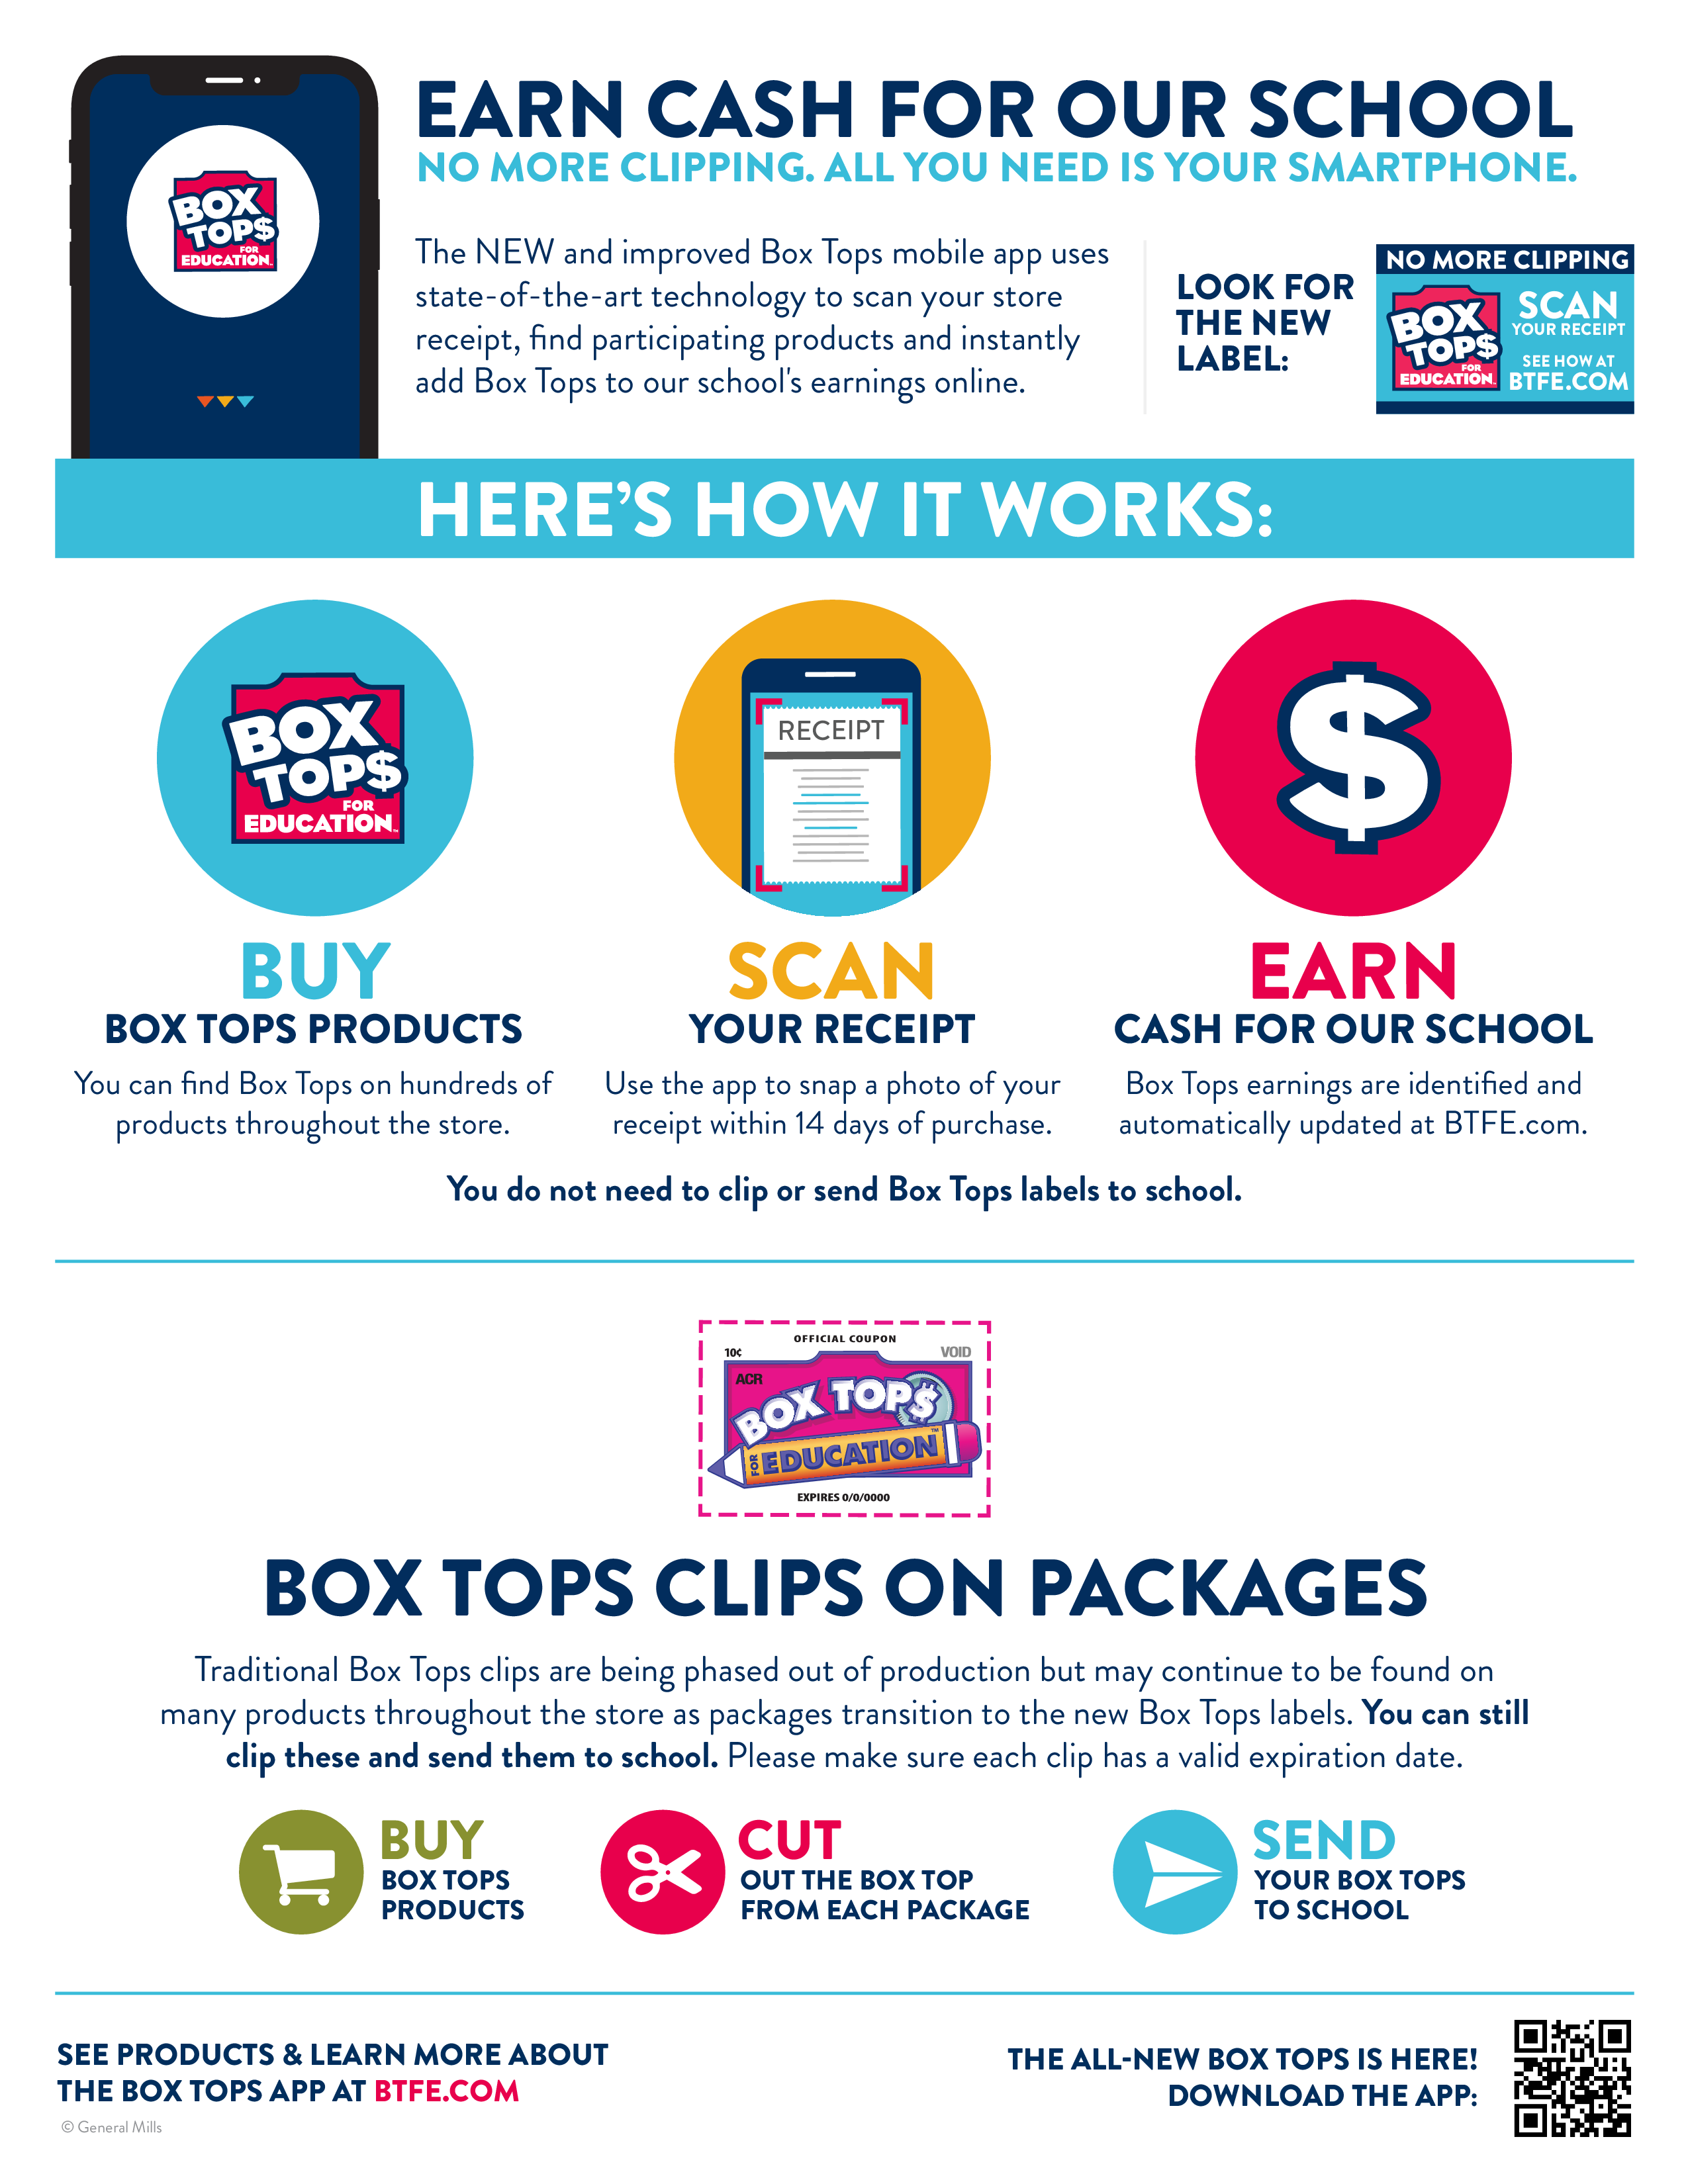 Box tops instructions